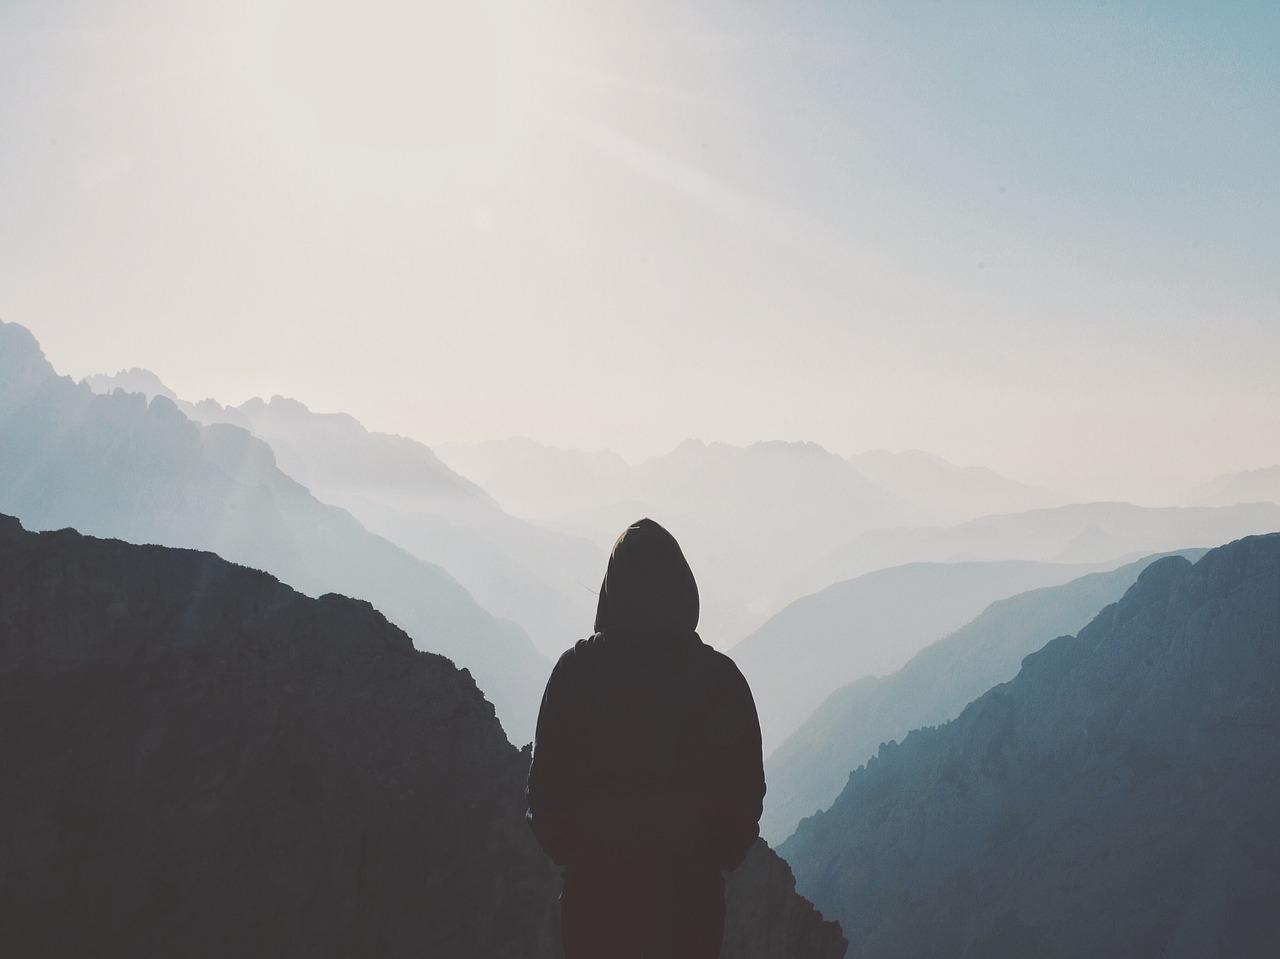 как побороть синдром самозванца